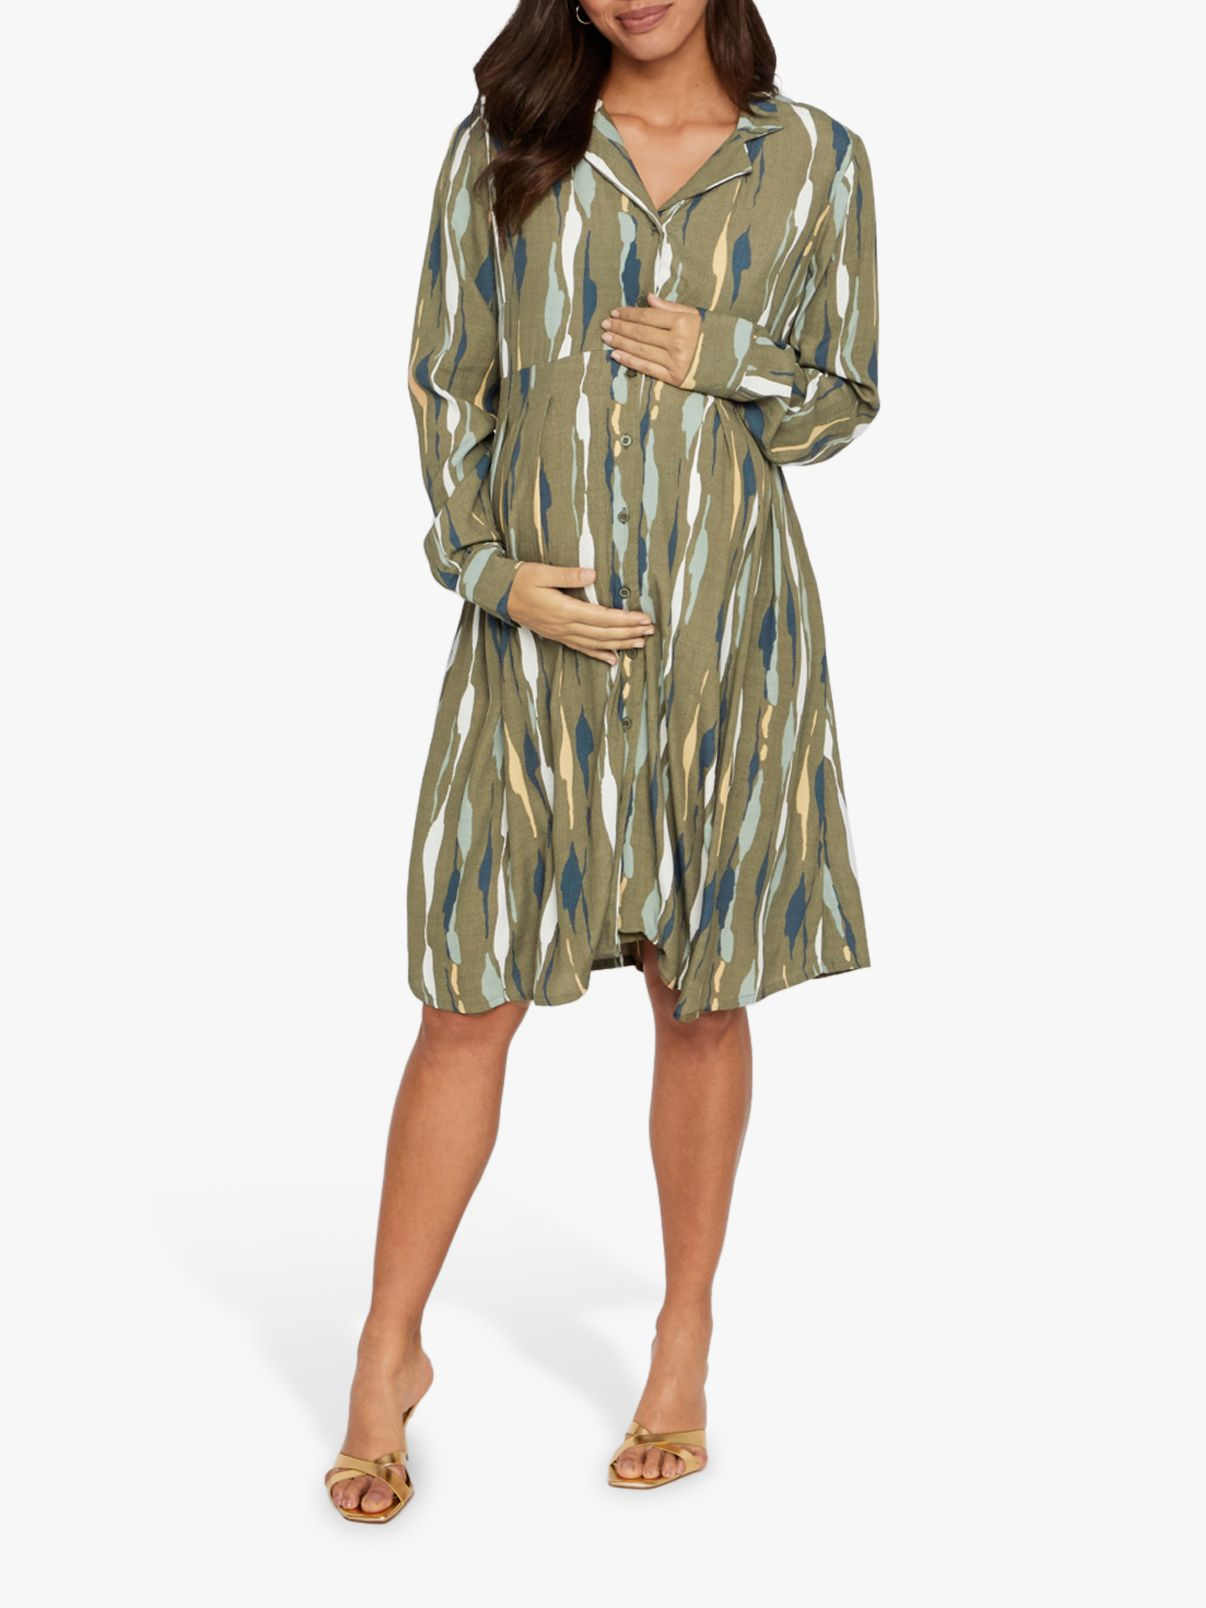 Mamalicious Mamalicious Dana Abstract Long Sleeve Woven Maternity Dress, Multi